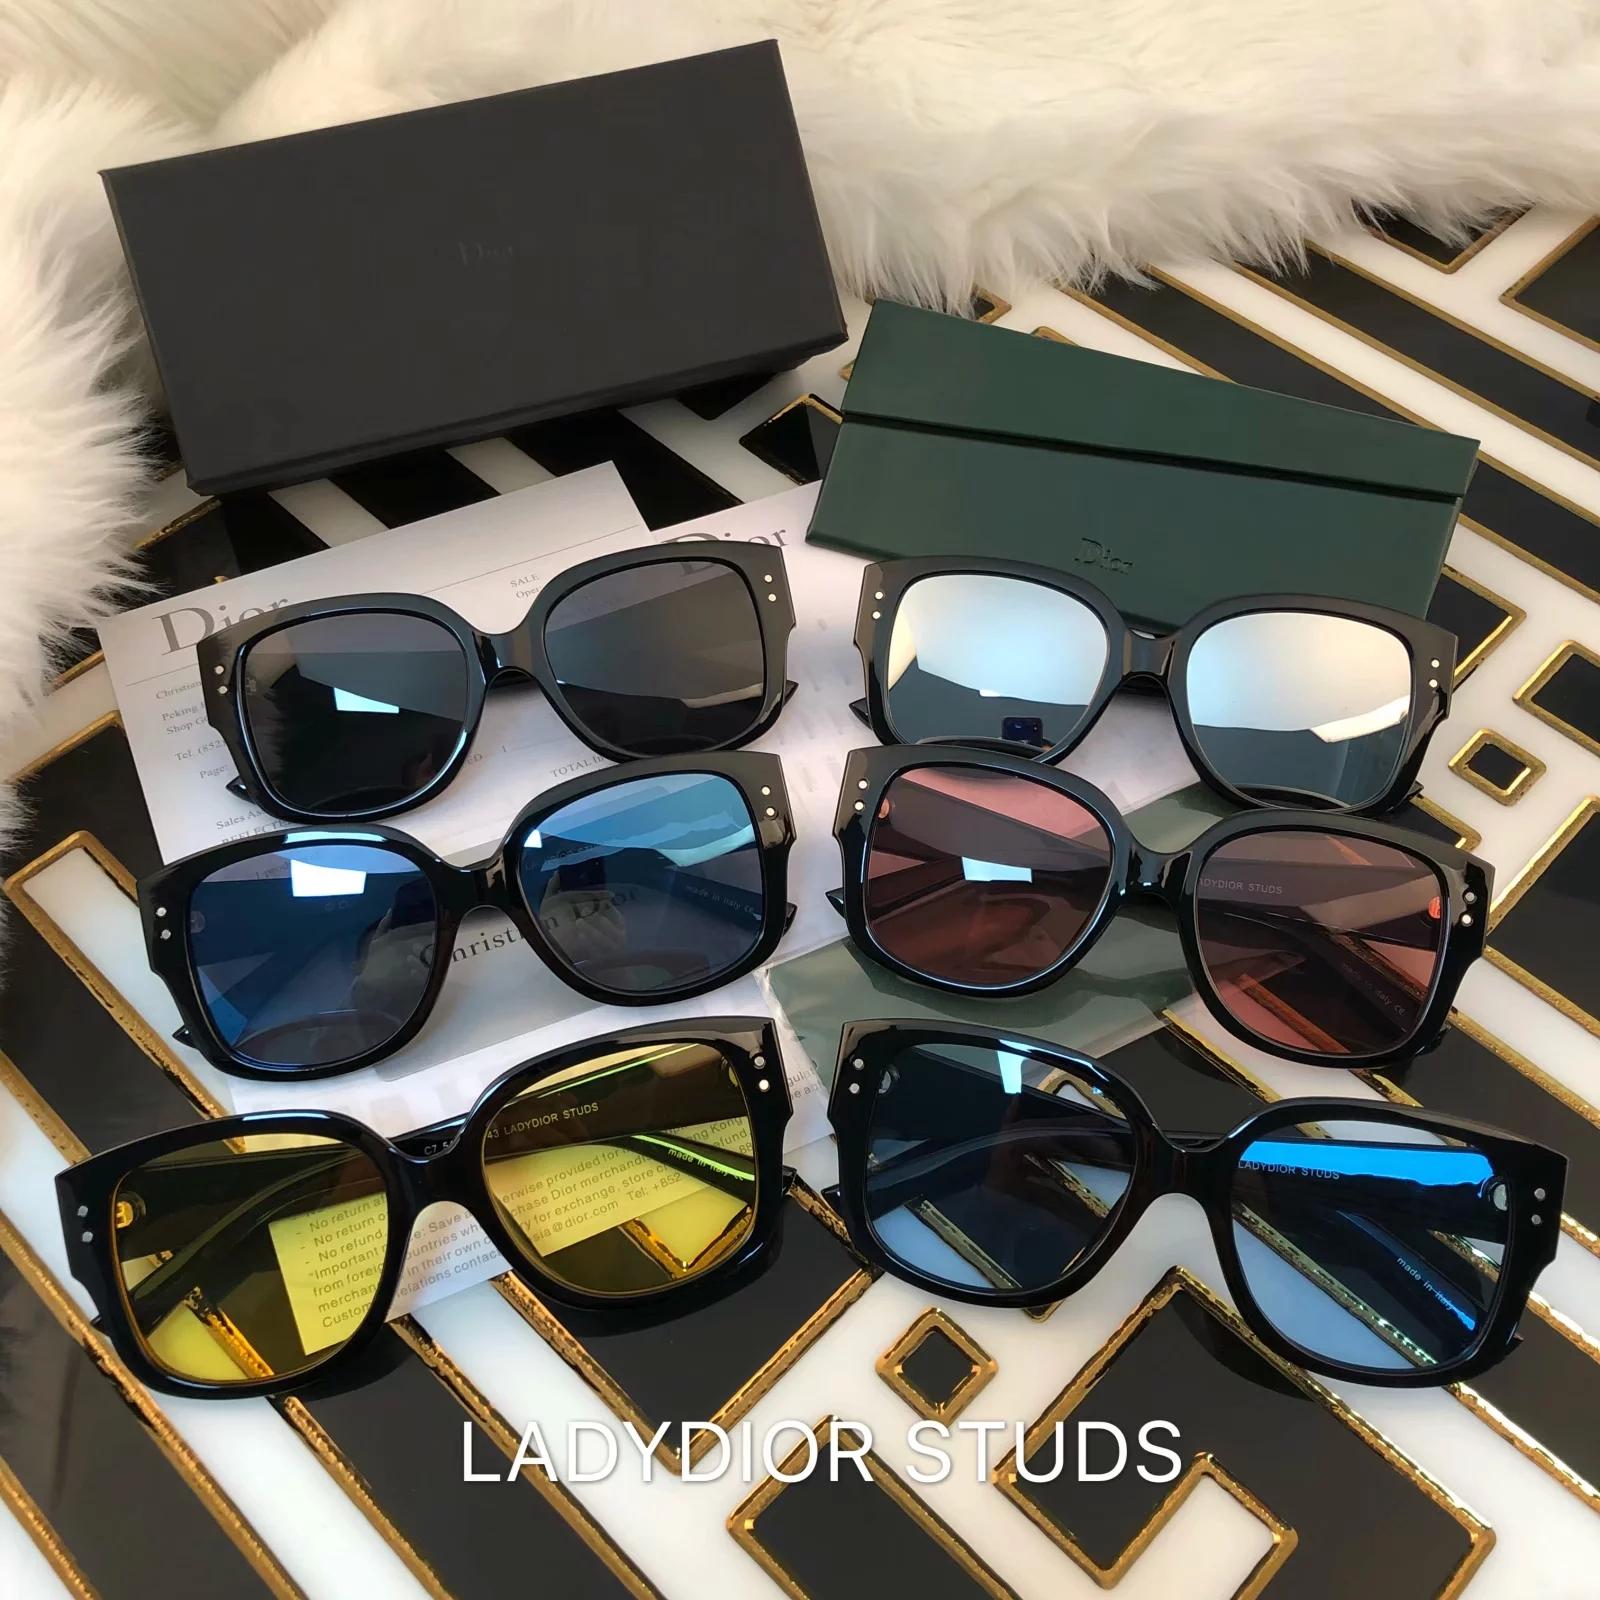 458f25adb640 Dior Sunglasses Women Brand Designer Small Square Sunglases Women Driving  Fishing EyeGlasses Fashion Optical